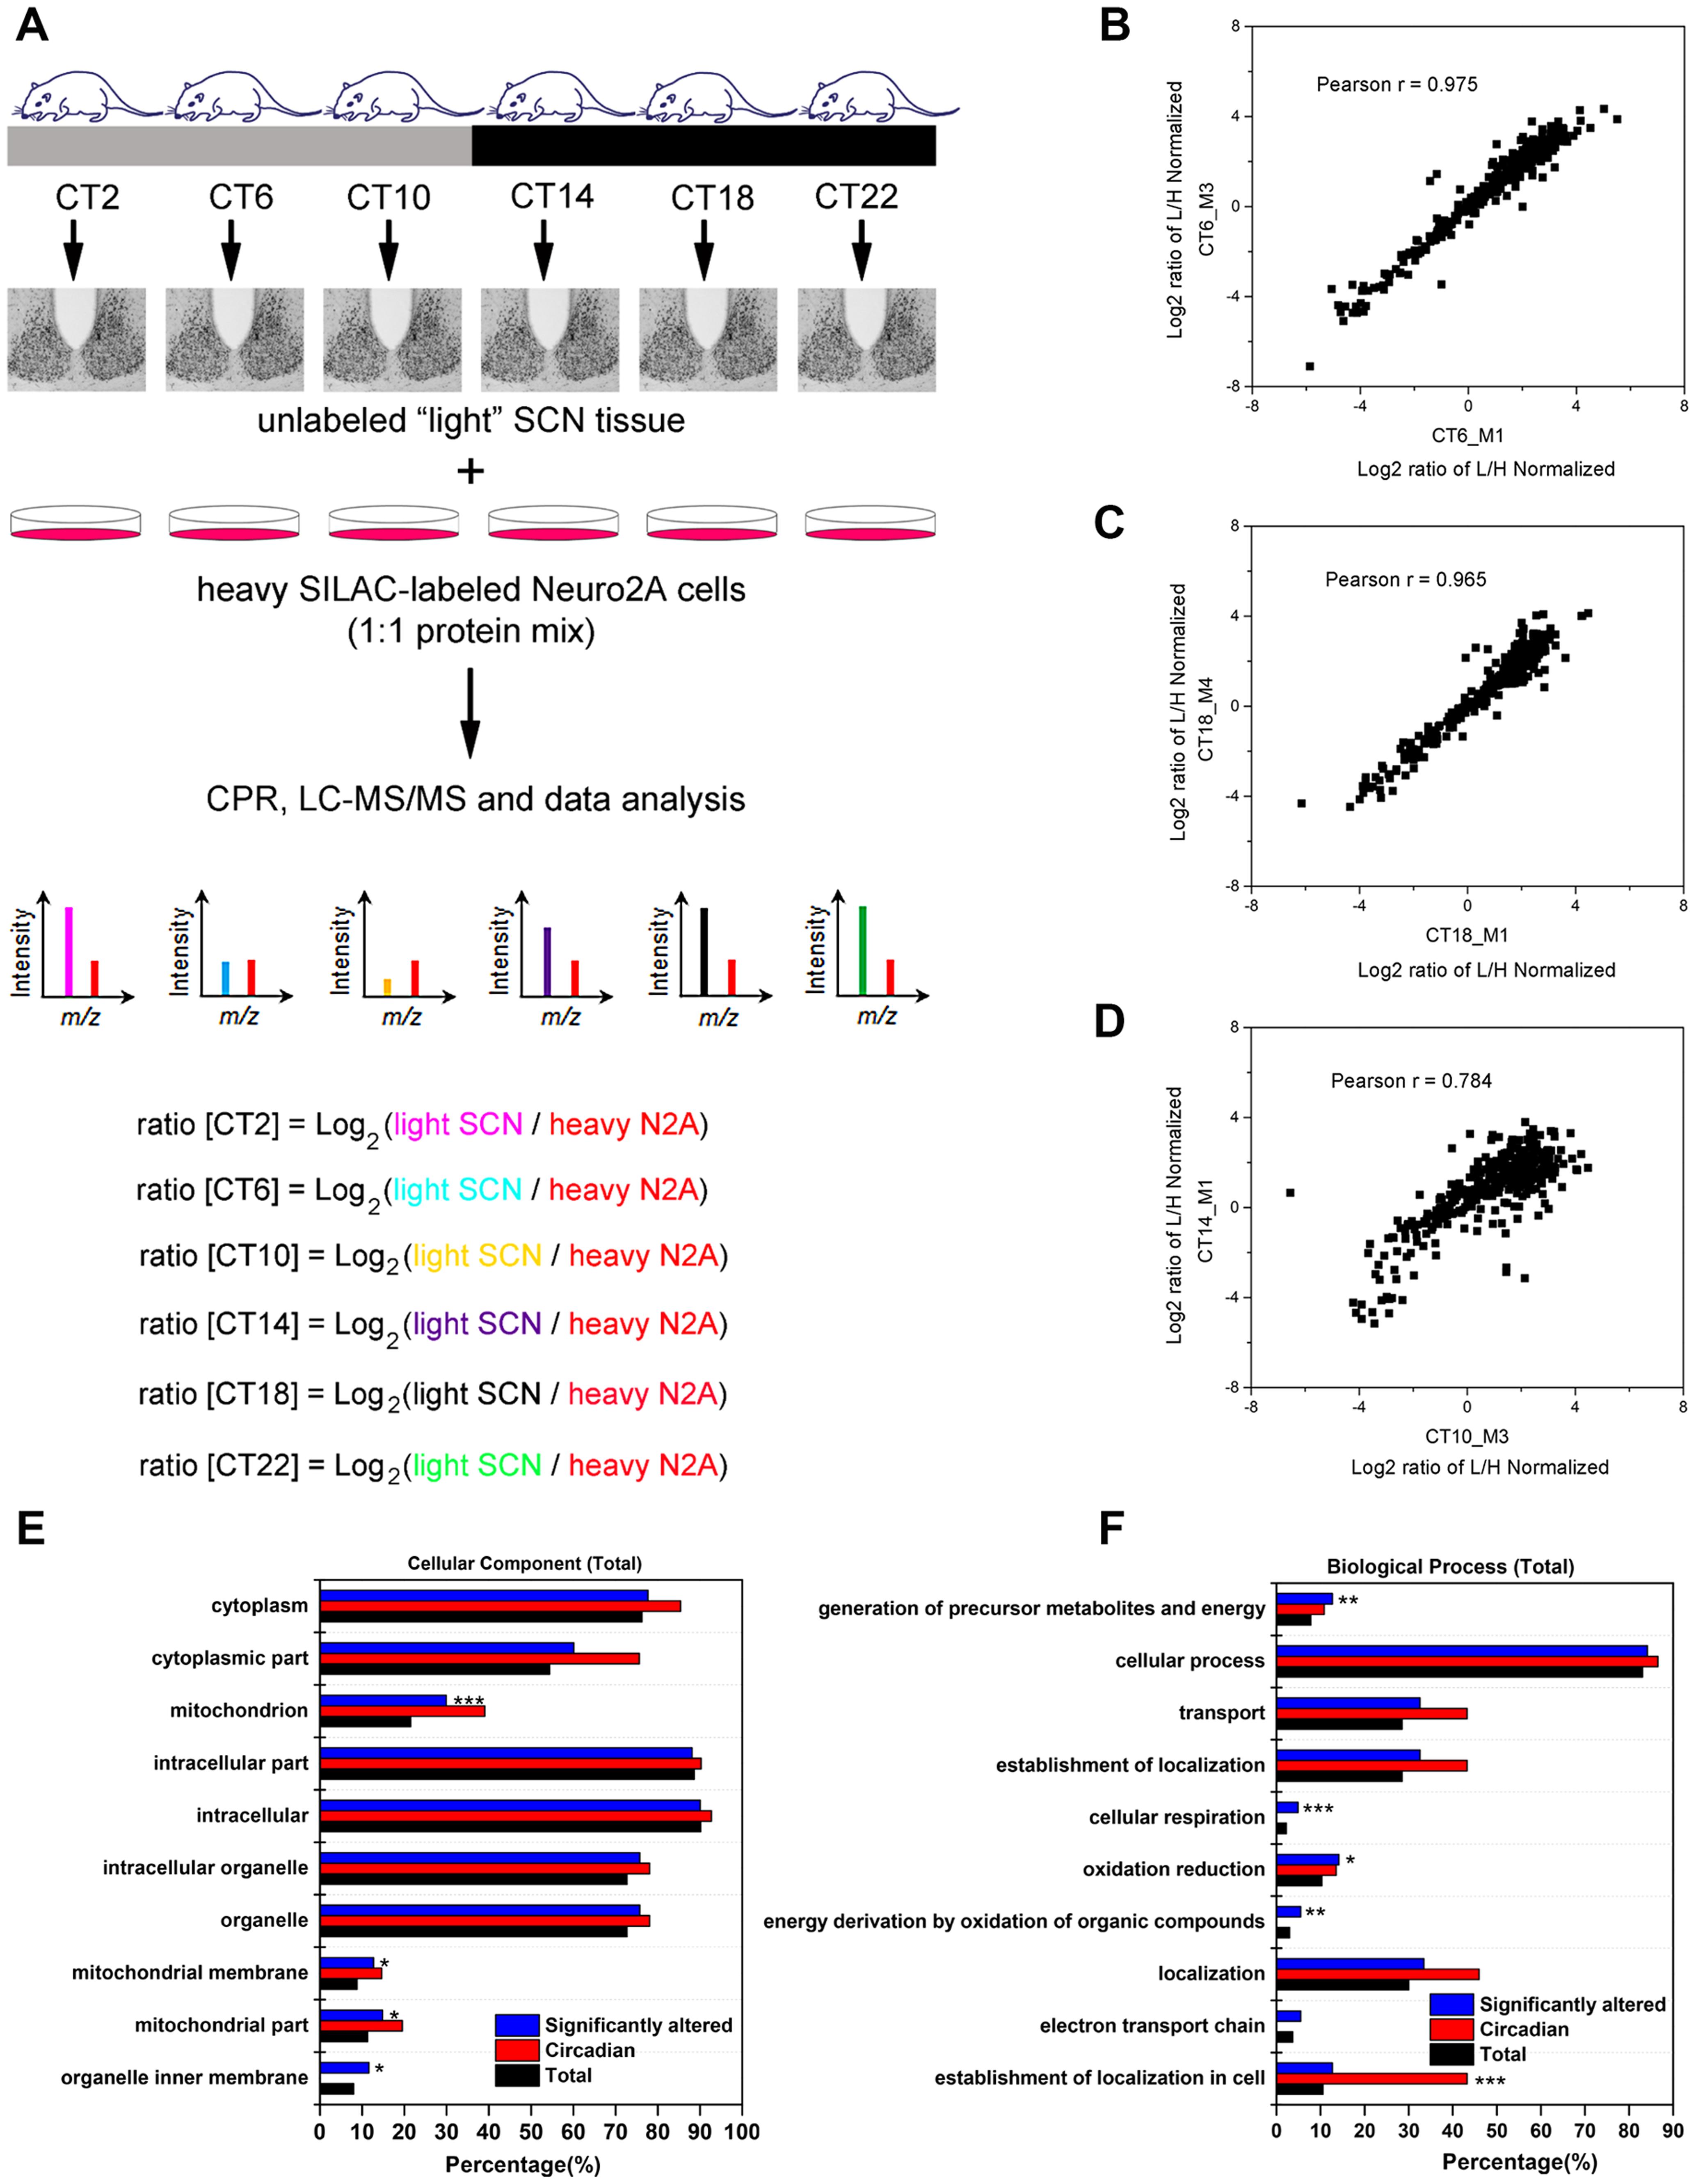 Global proteomic analysis of the murine SCN.